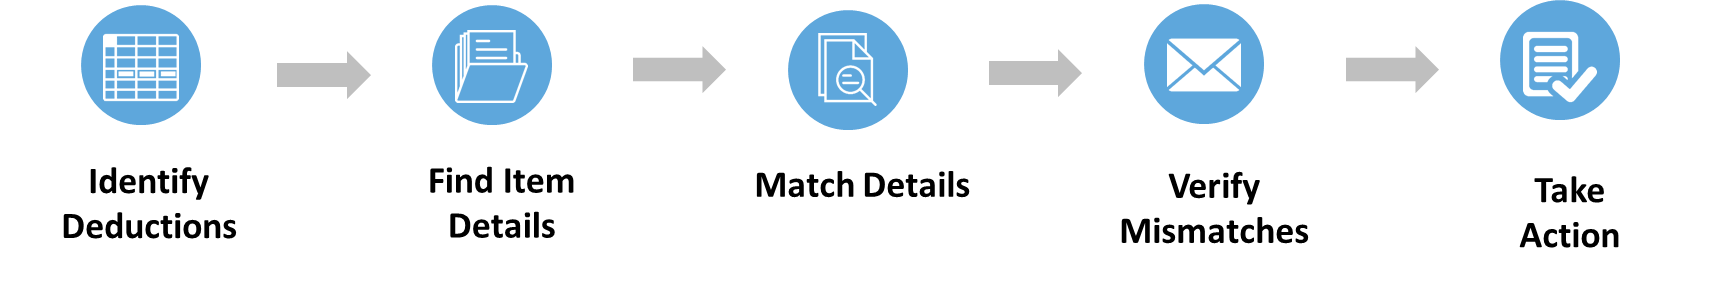 Manual Steps in Resolving Deductions